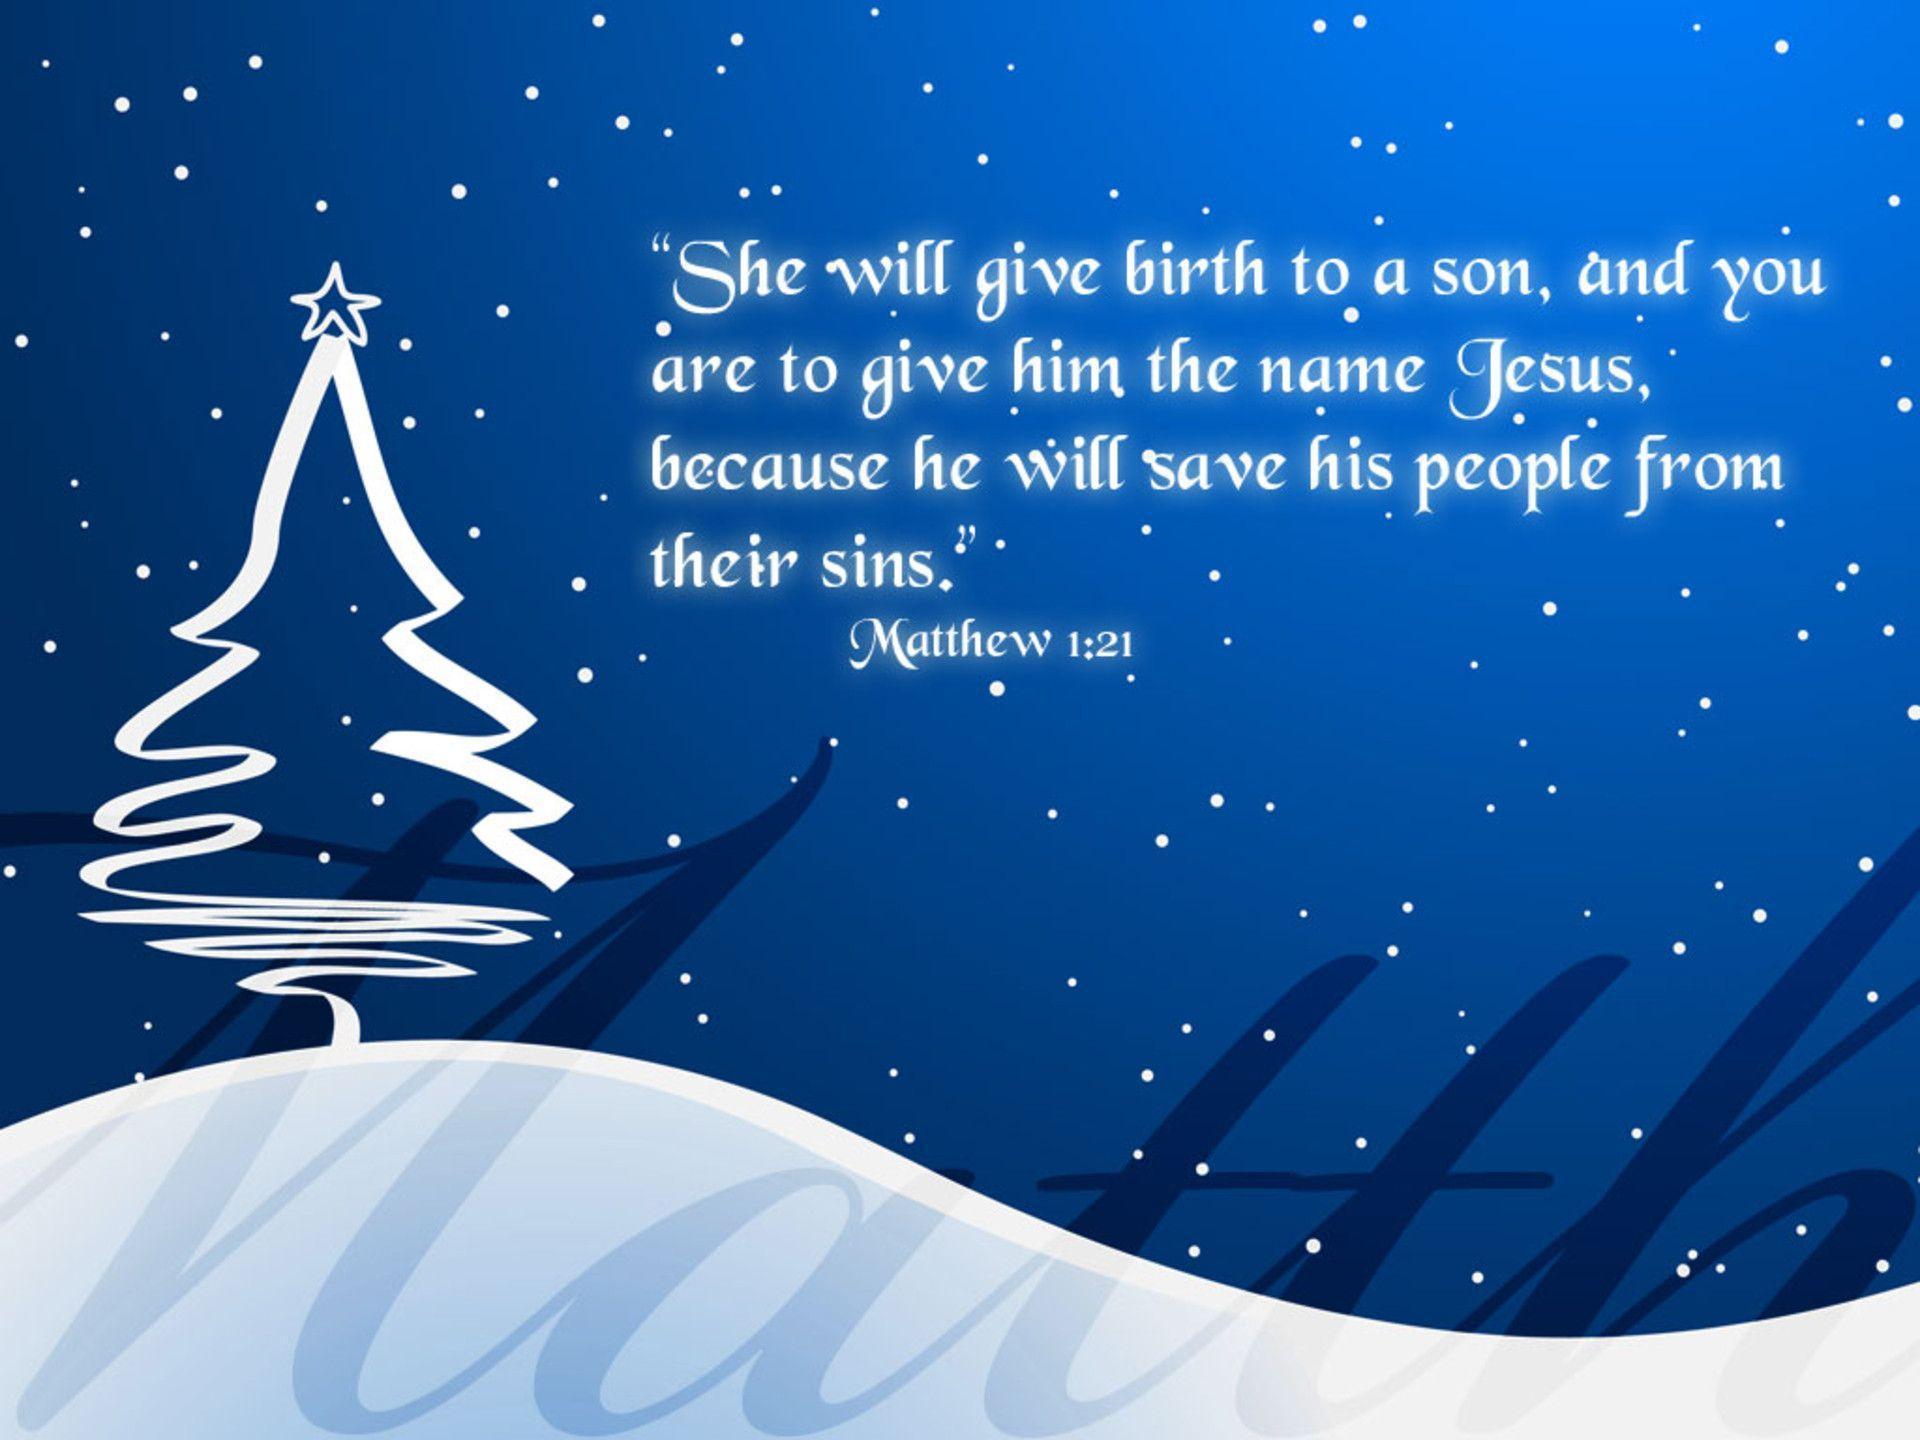 Christian Christmas Wallpapers - Wallpaper Cave